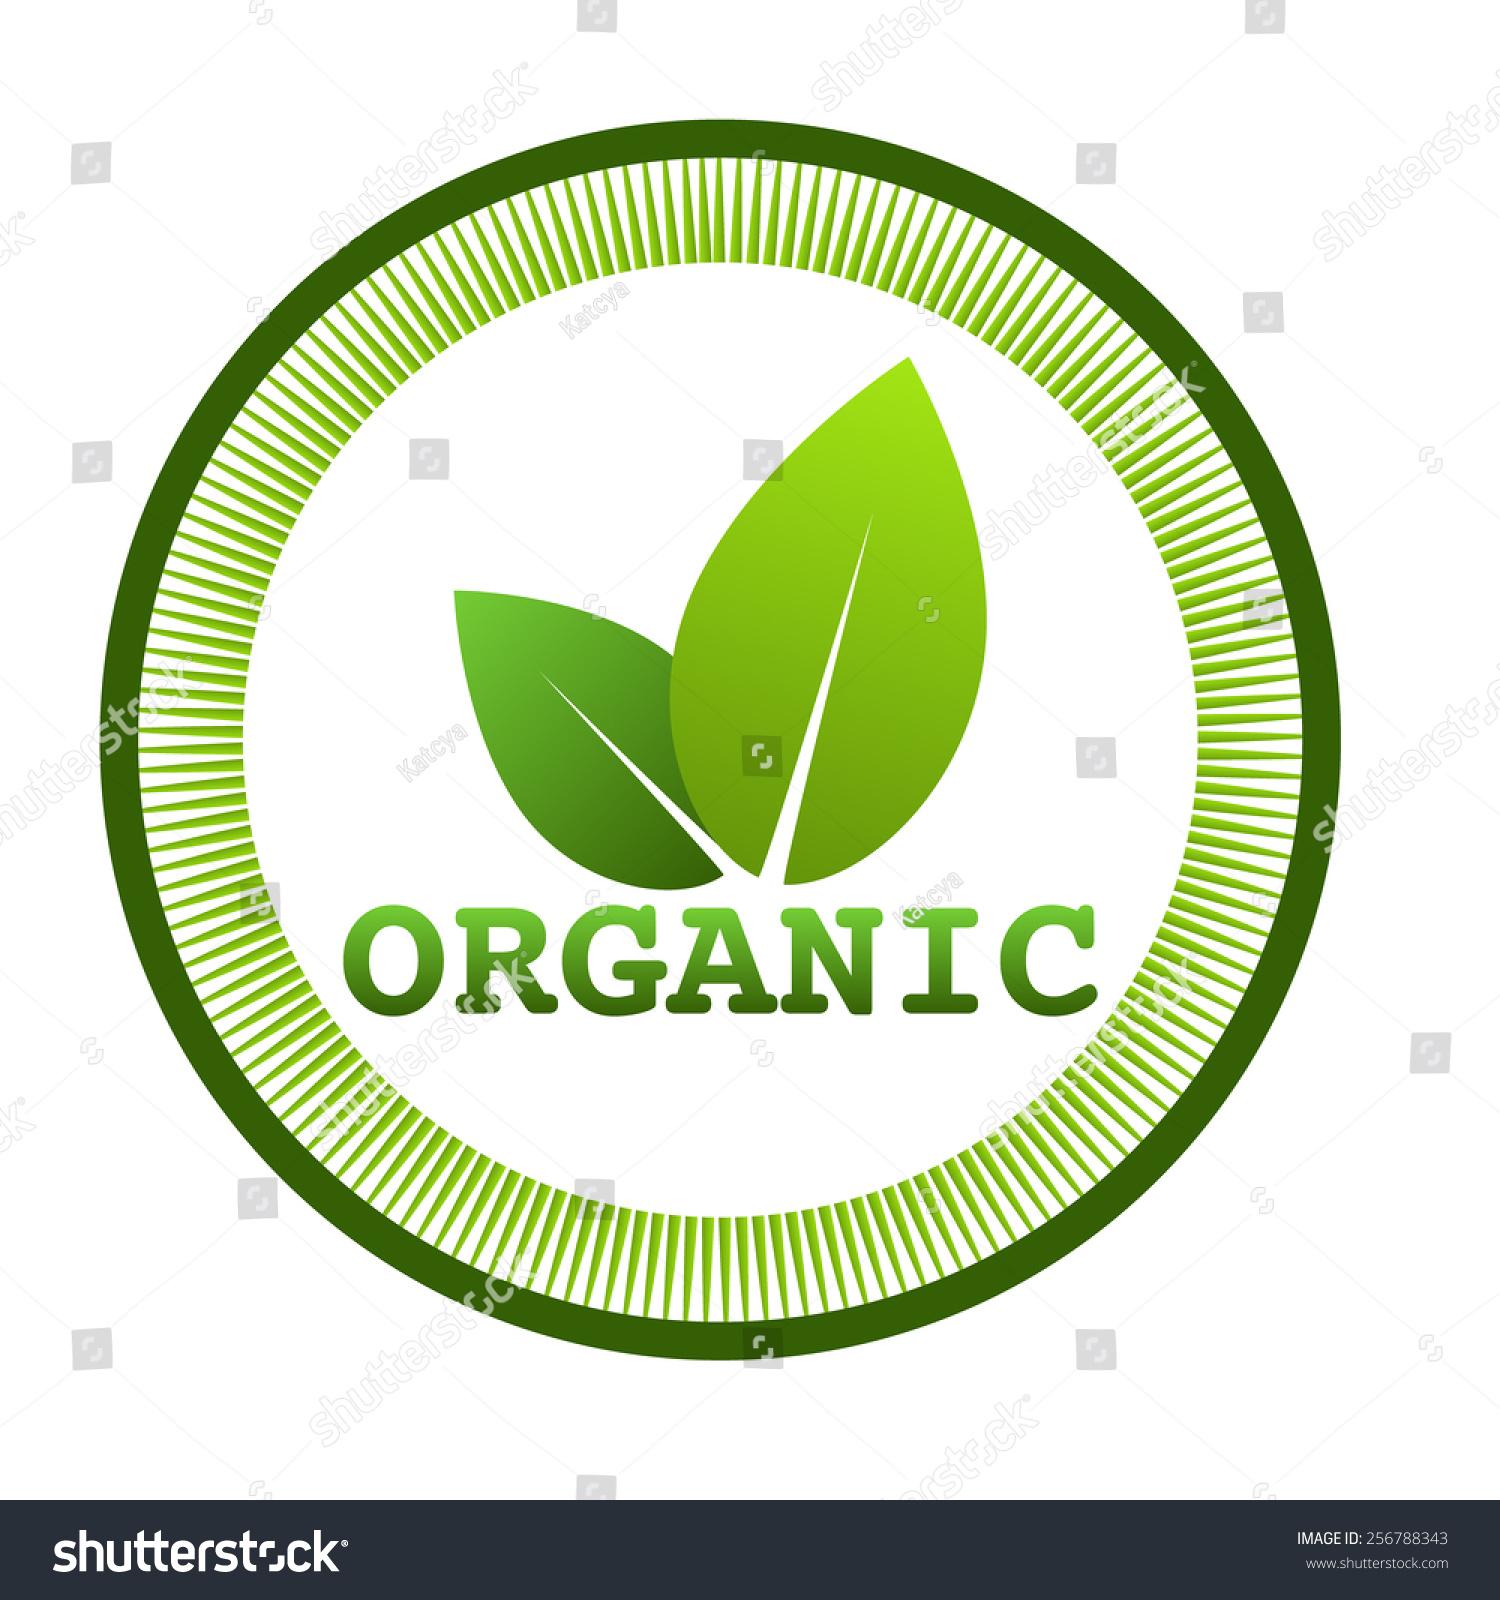 Eco certification bio certification organic certification stock eco certification bio certification organic certification green label green leaves label buycottarizona